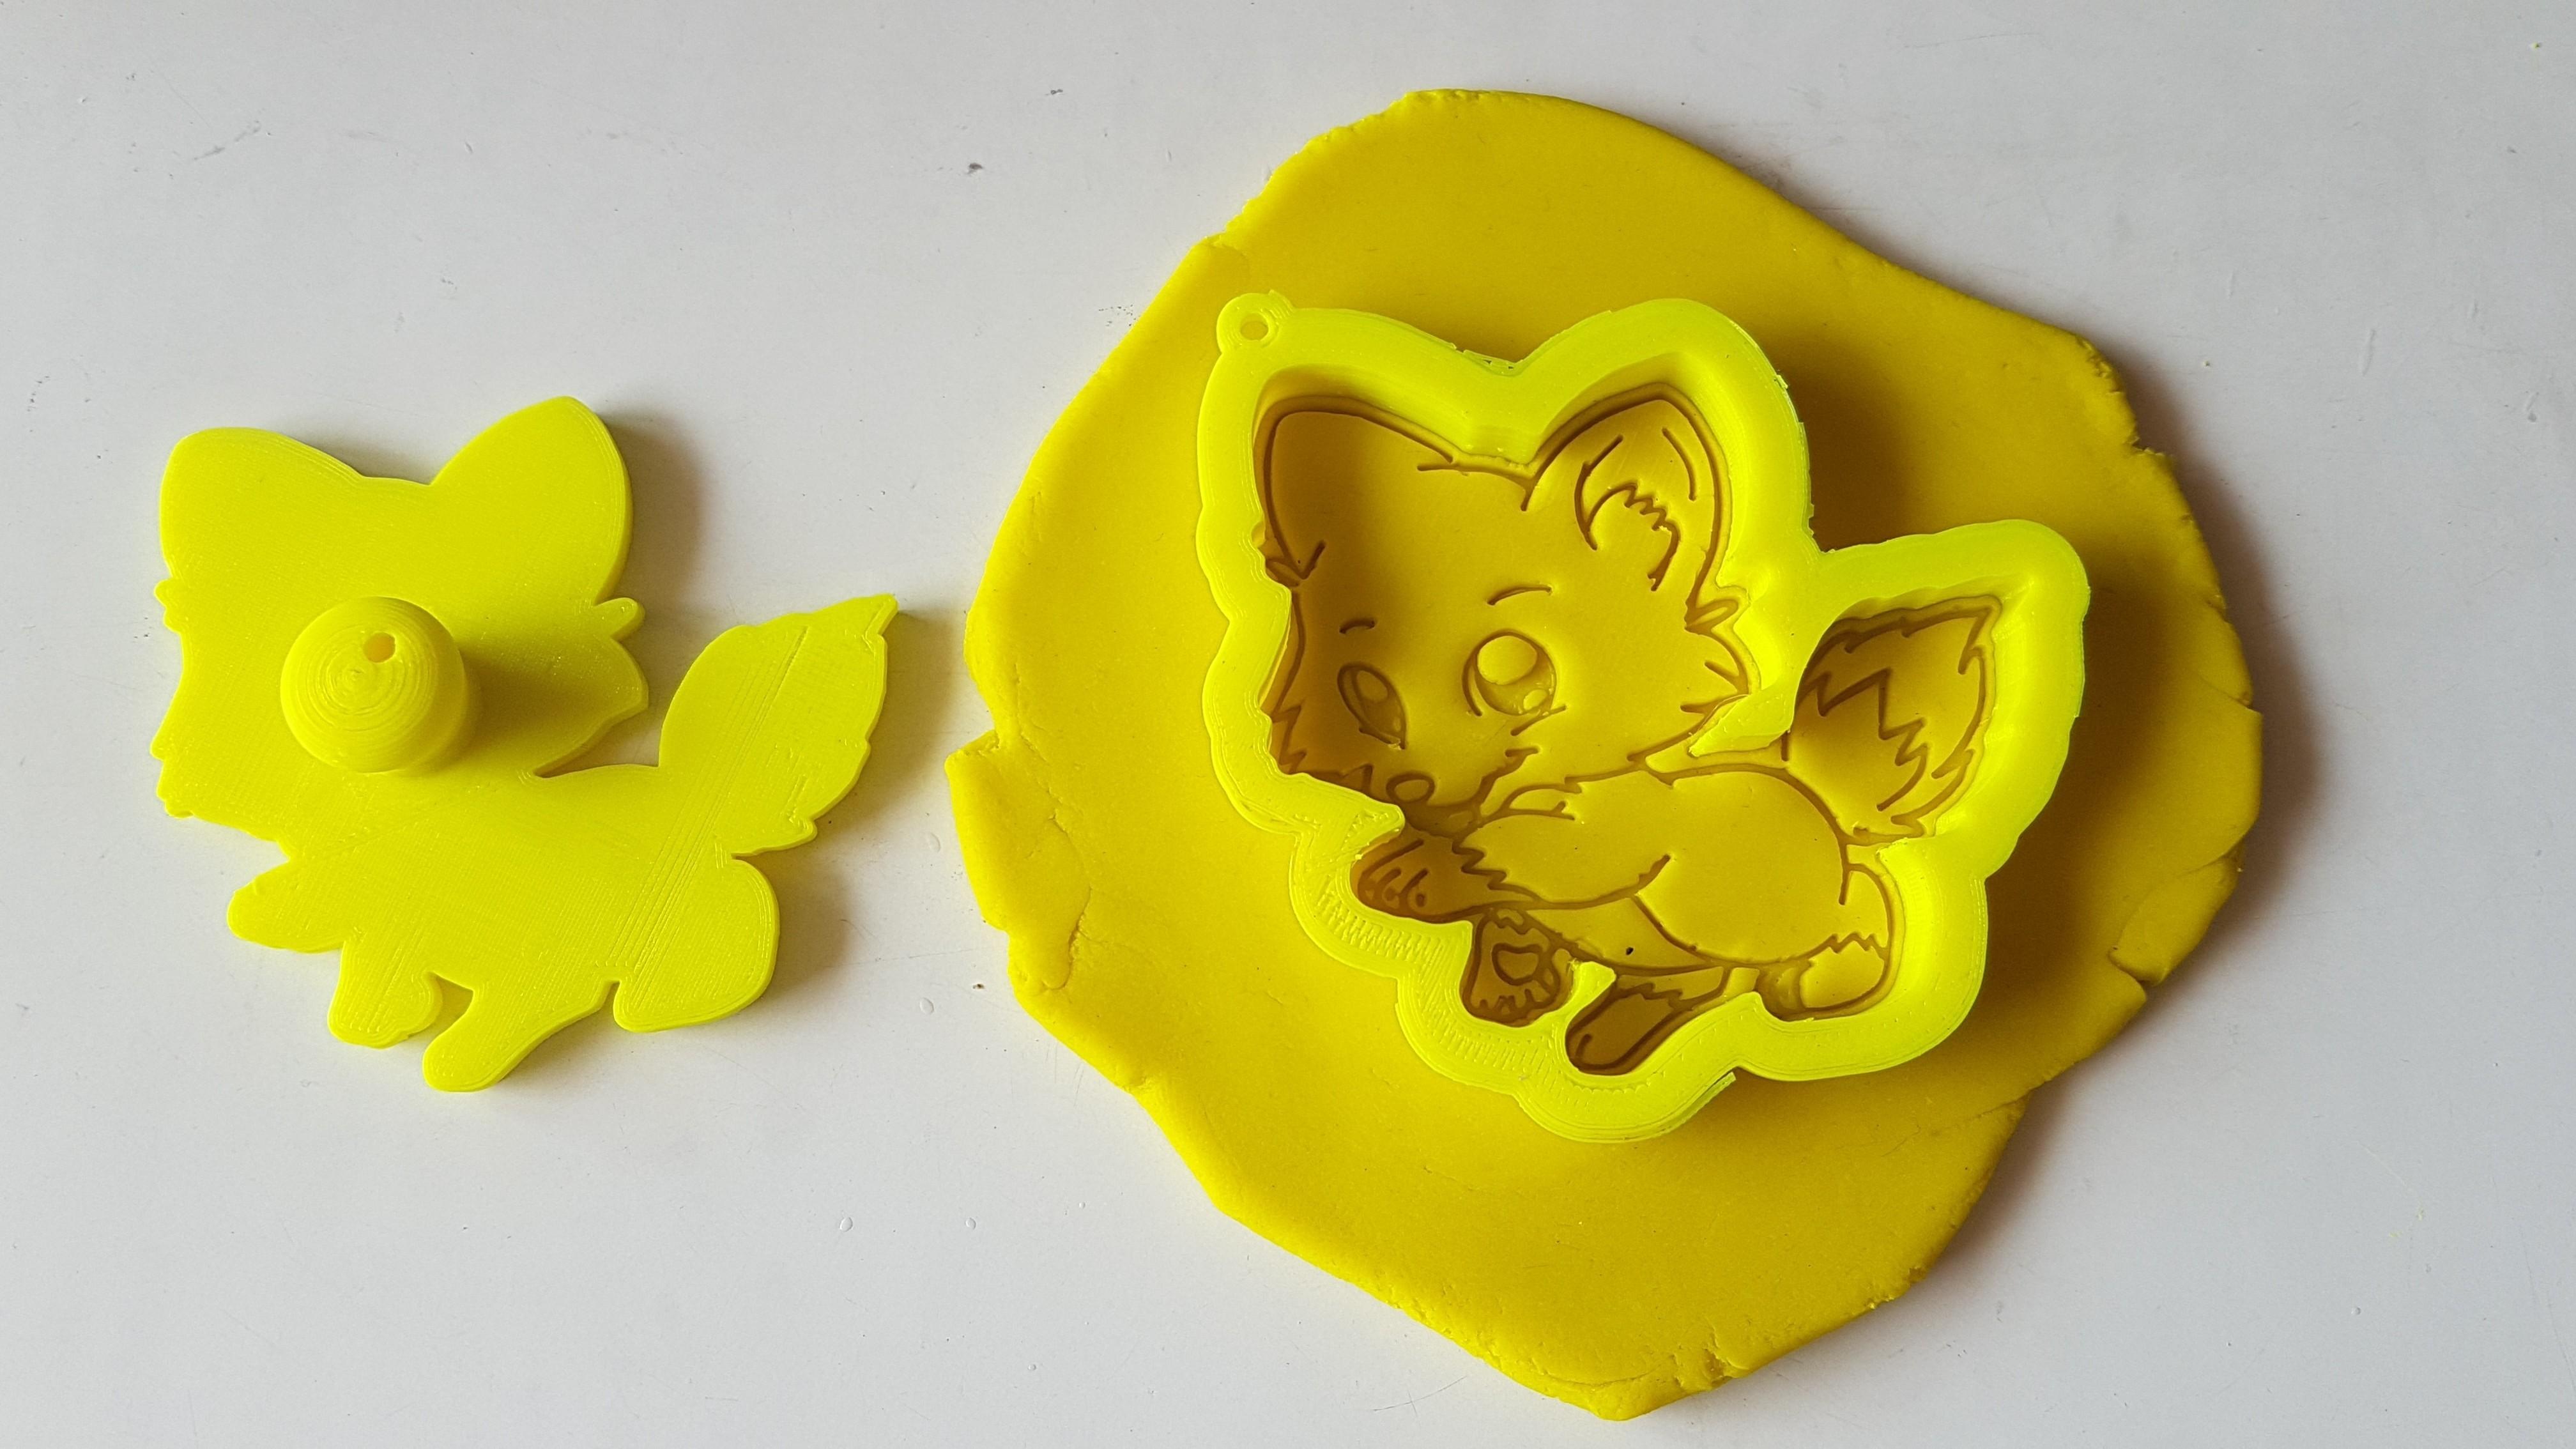 20180828_135727.jpg Download STL file Cute Fox Cookie Cutter • 3D printer template, 3dfactory